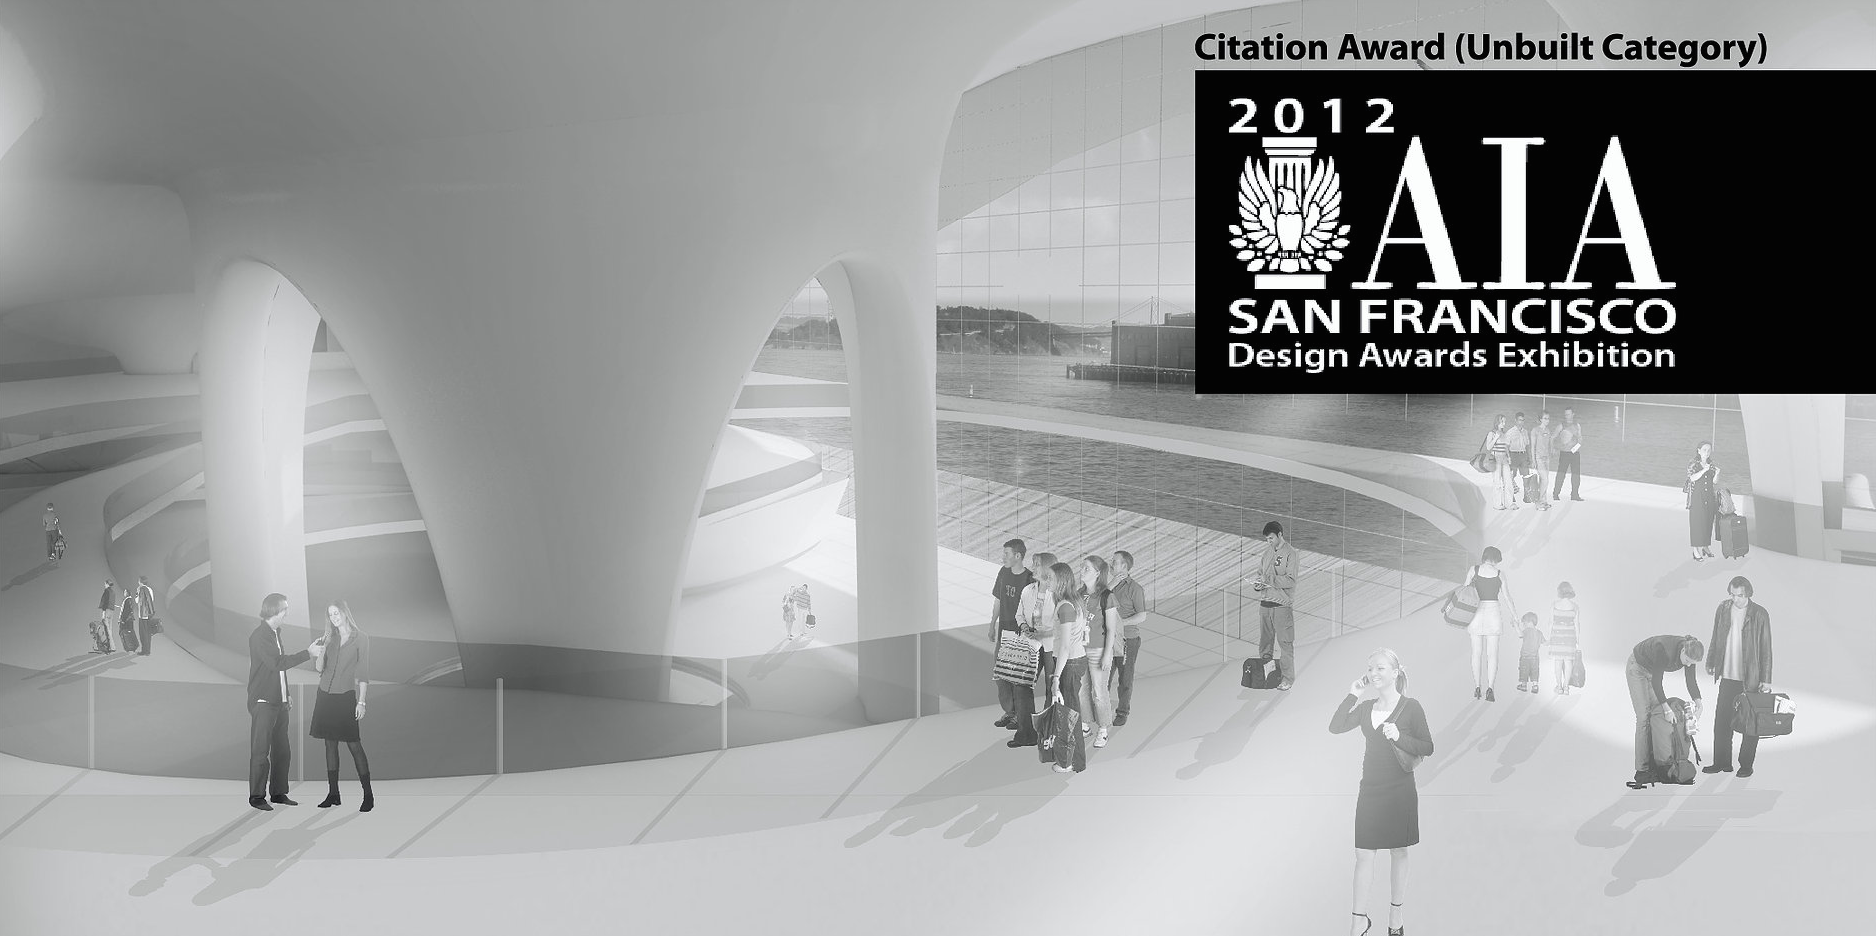 Peel 27 wins 2012 AIA SF Design Citation Award (Unbuilt Project) (American Institute of Architect-San Francisco)